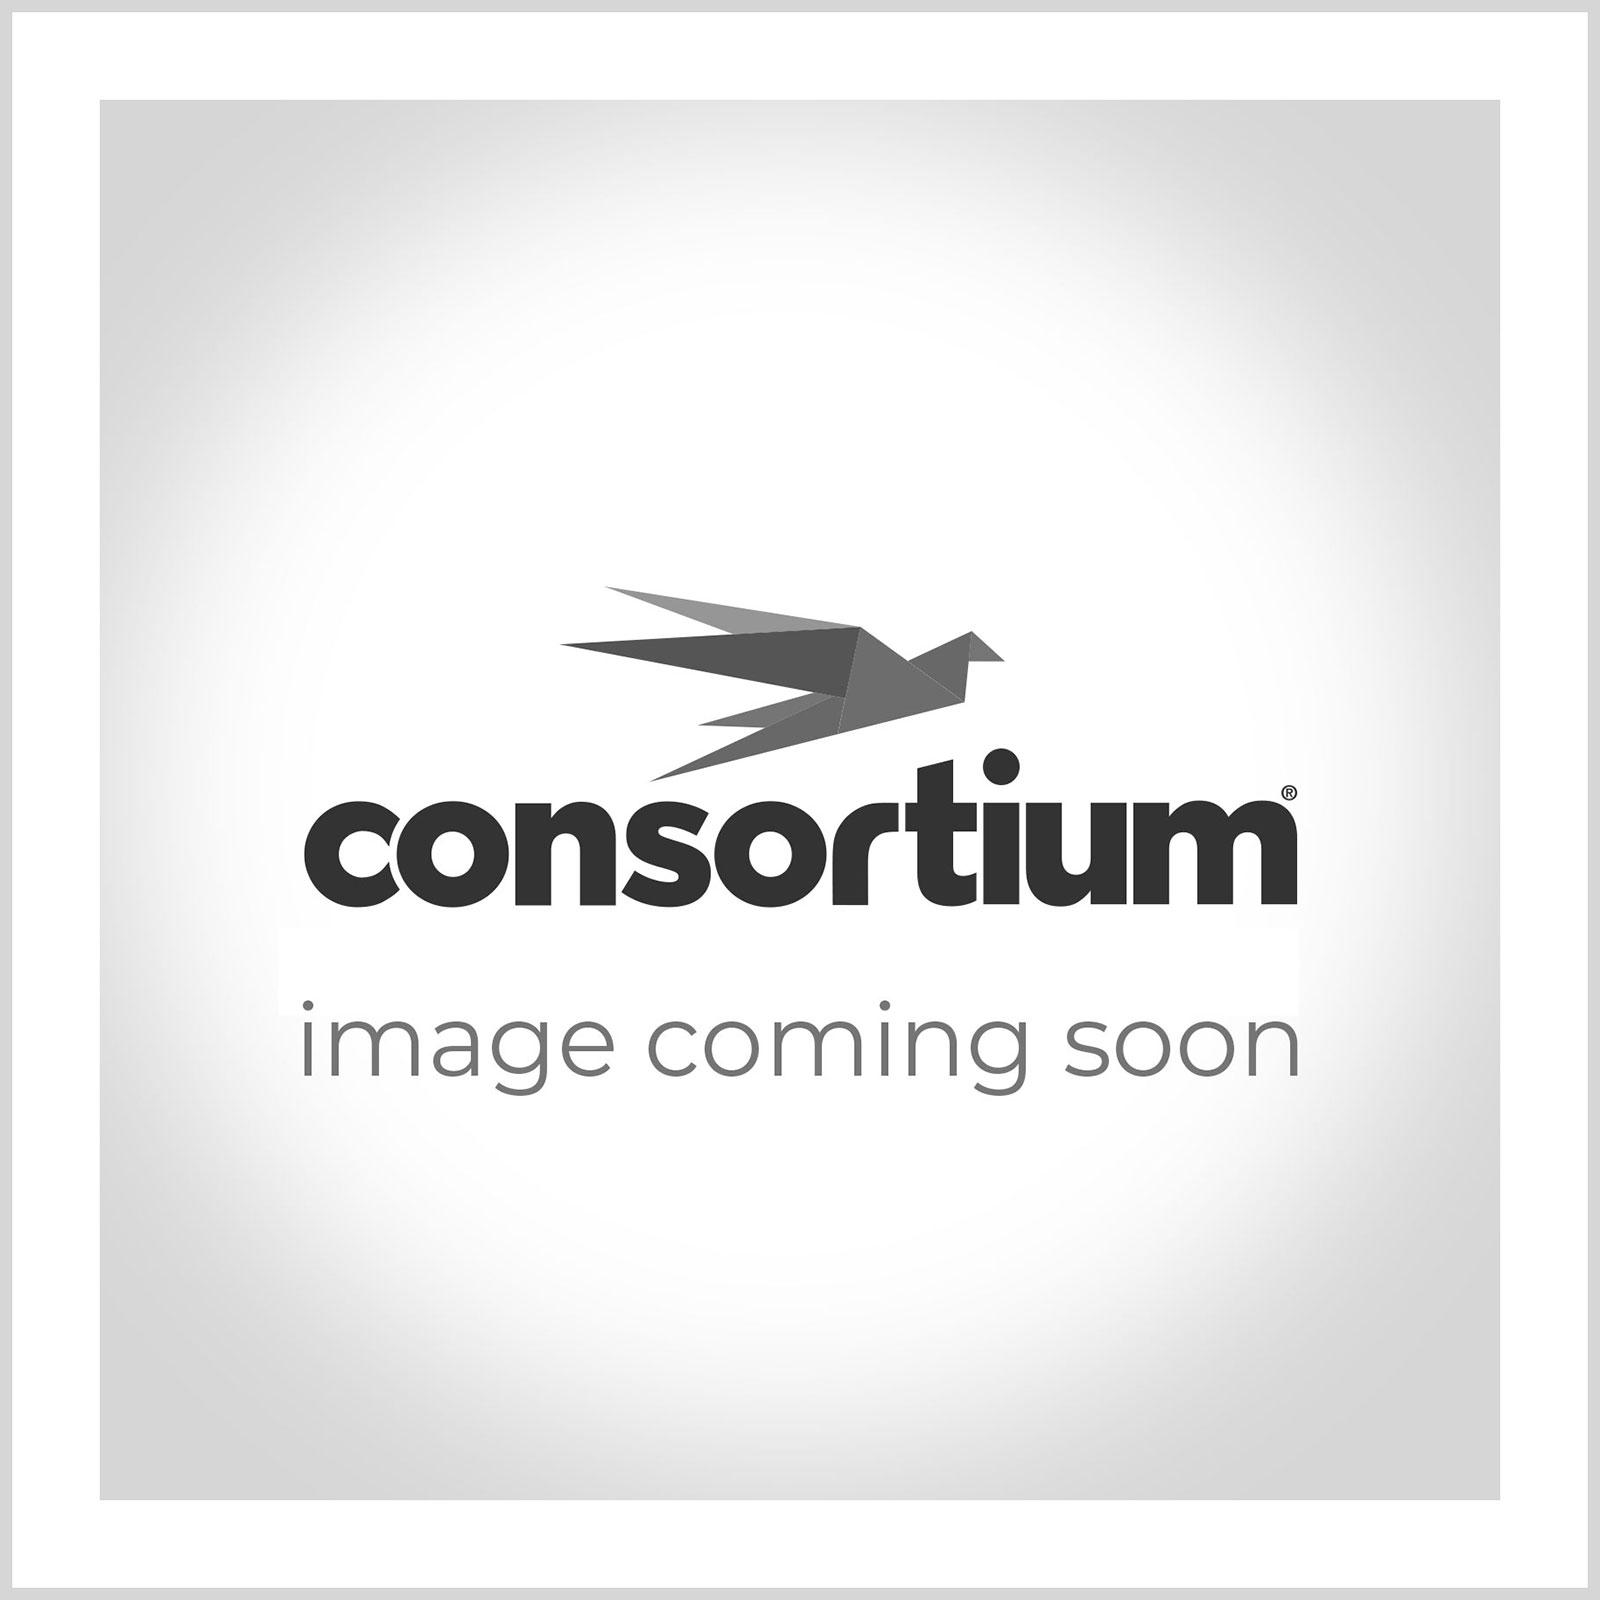 Nana's Manners Cutlery